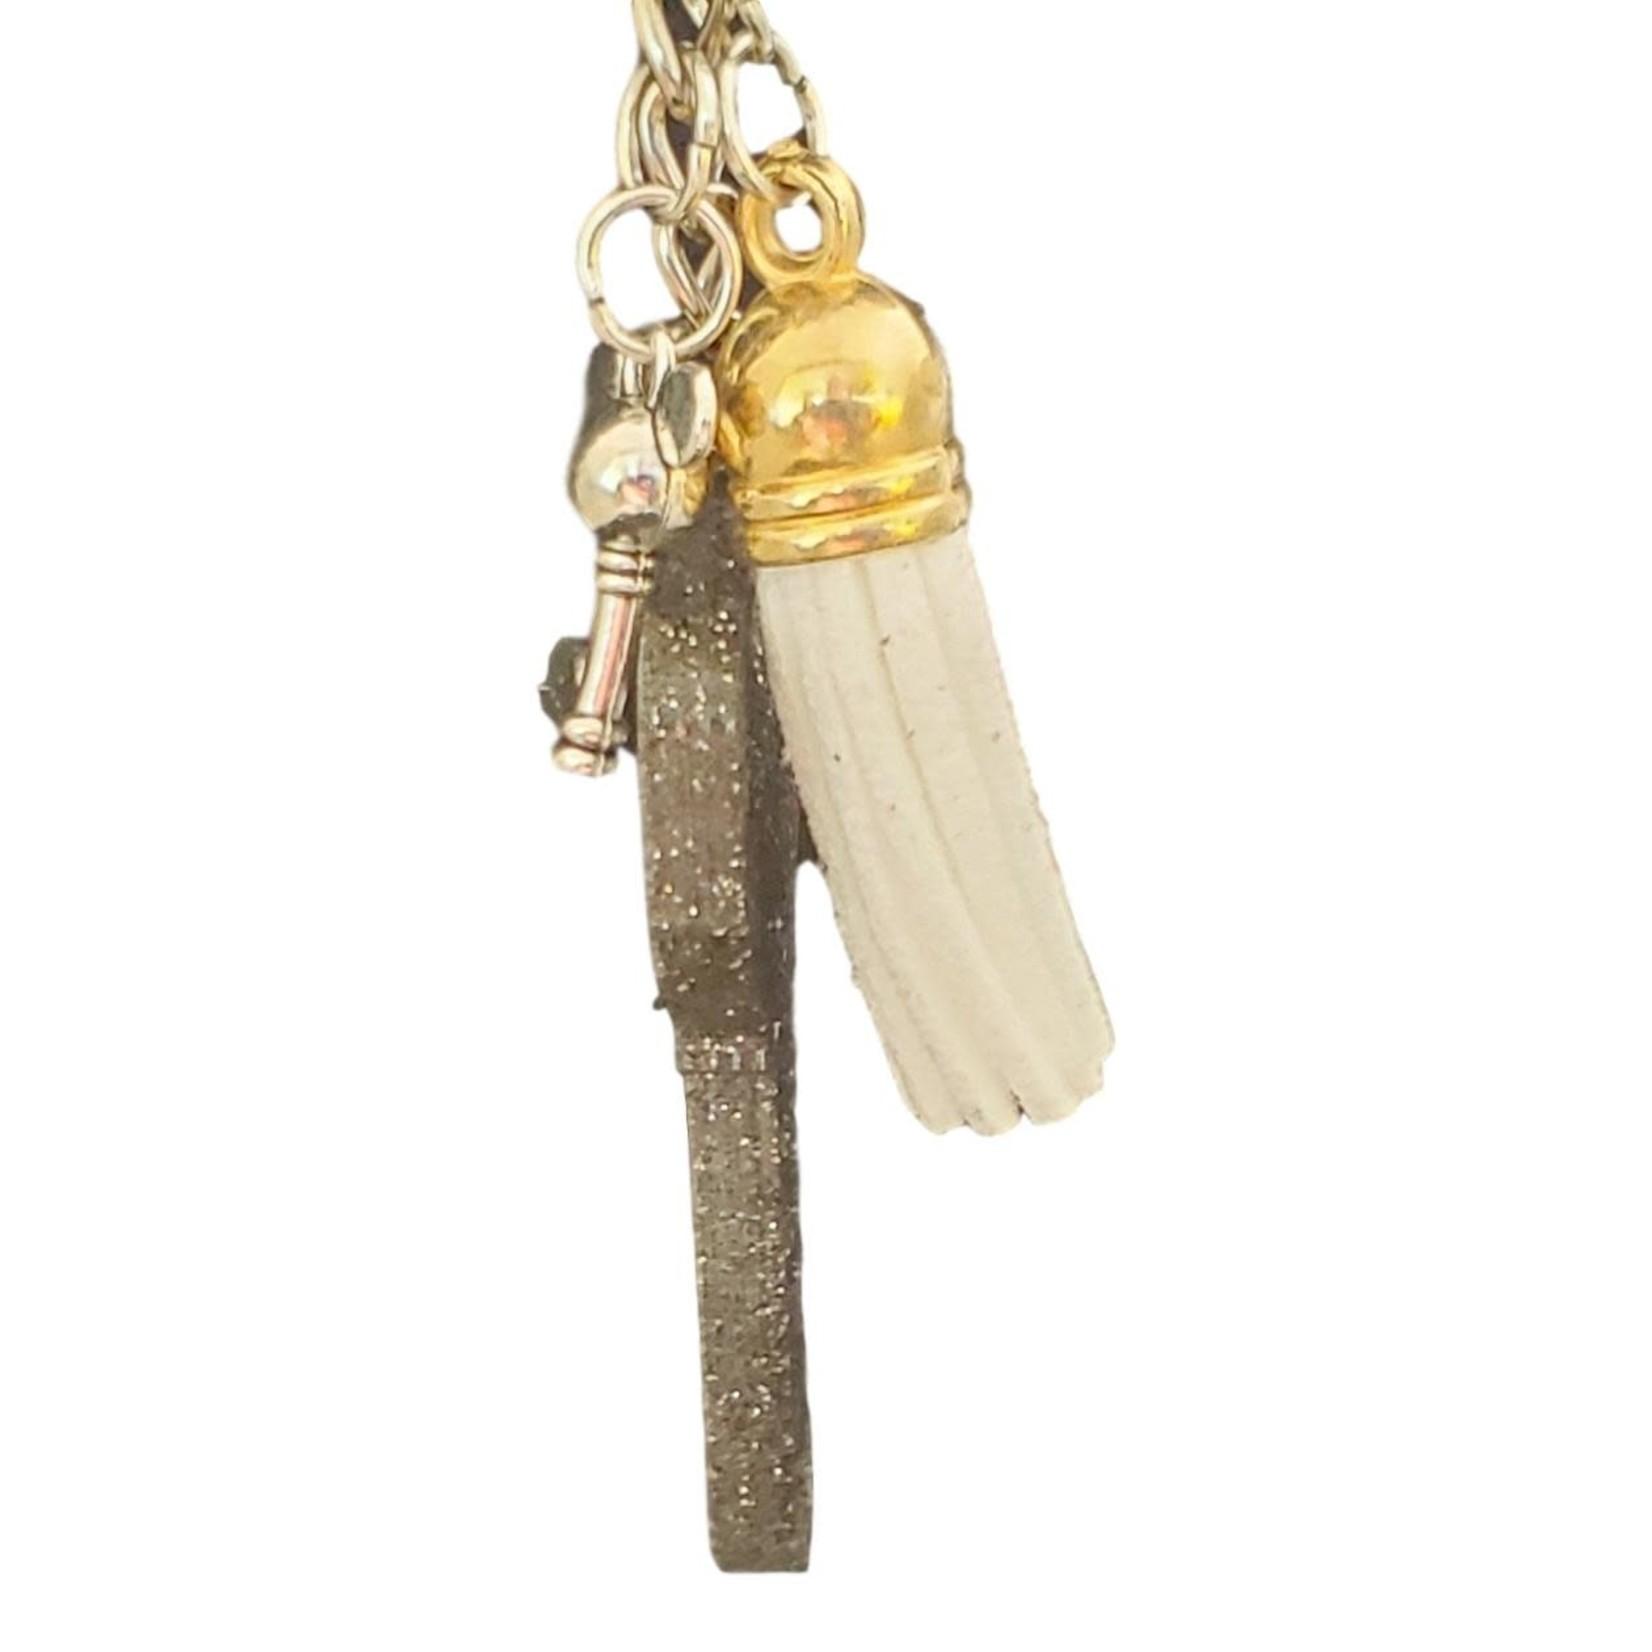 East Coast Sirens Black Glitter Key with Charms Key Chain